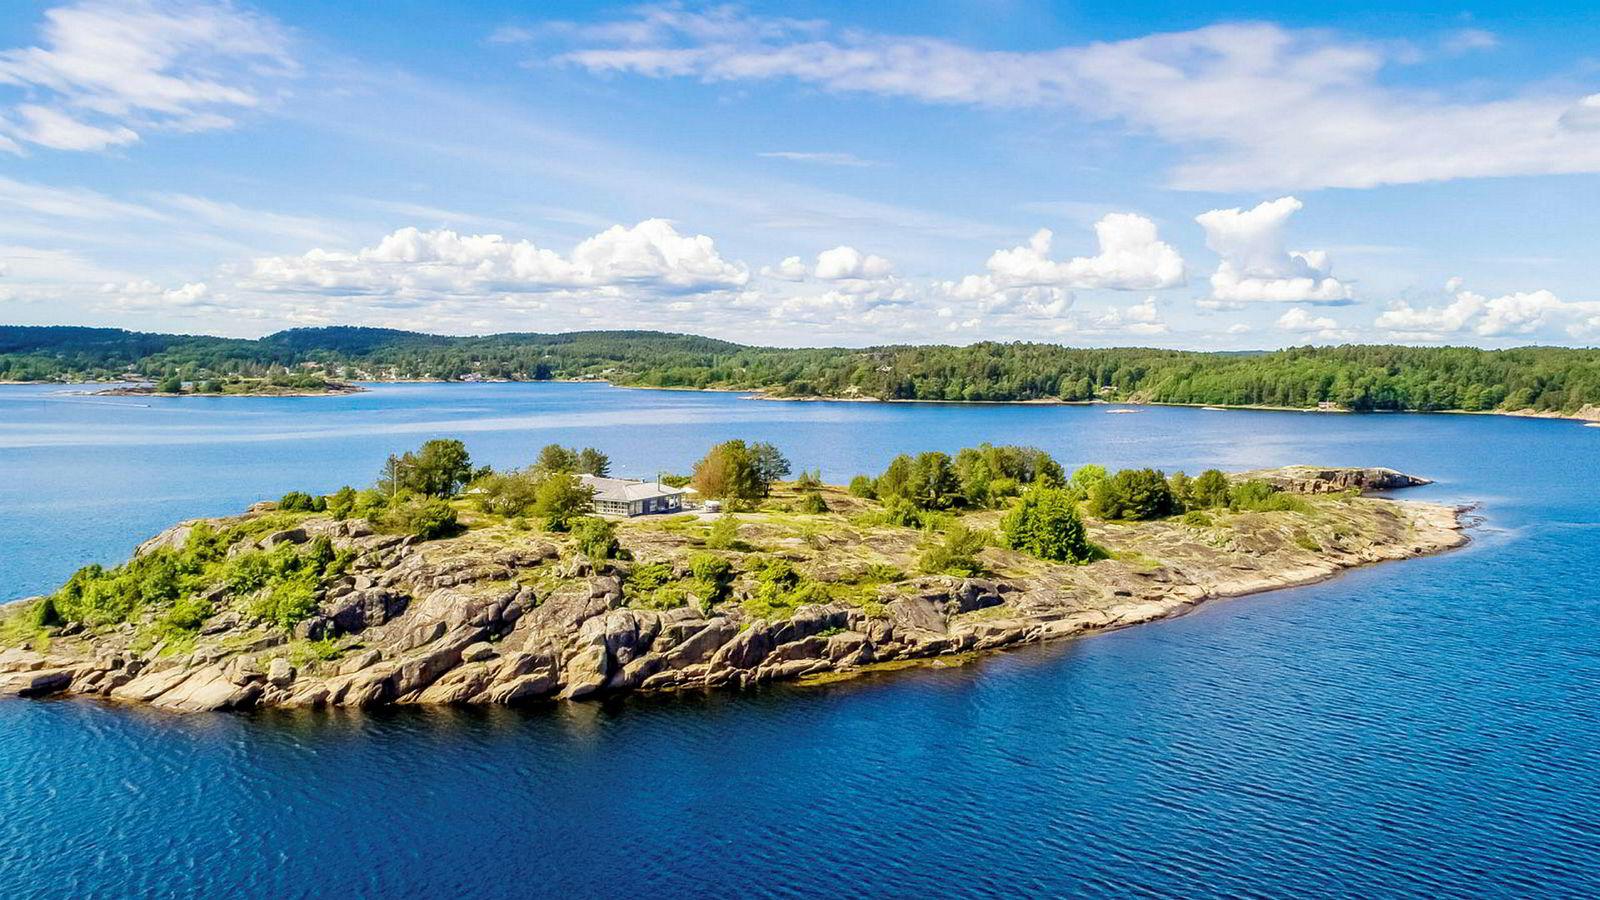 Investor Tone Bjørseth-Andersen og ektemannen John Andersen kjøpte denne øya på Tjøme i Færder kommune for 33 millioner kroner i fjor. Det var fjorårets dyreste sjøhyttesalg, ifølge Bisnode.